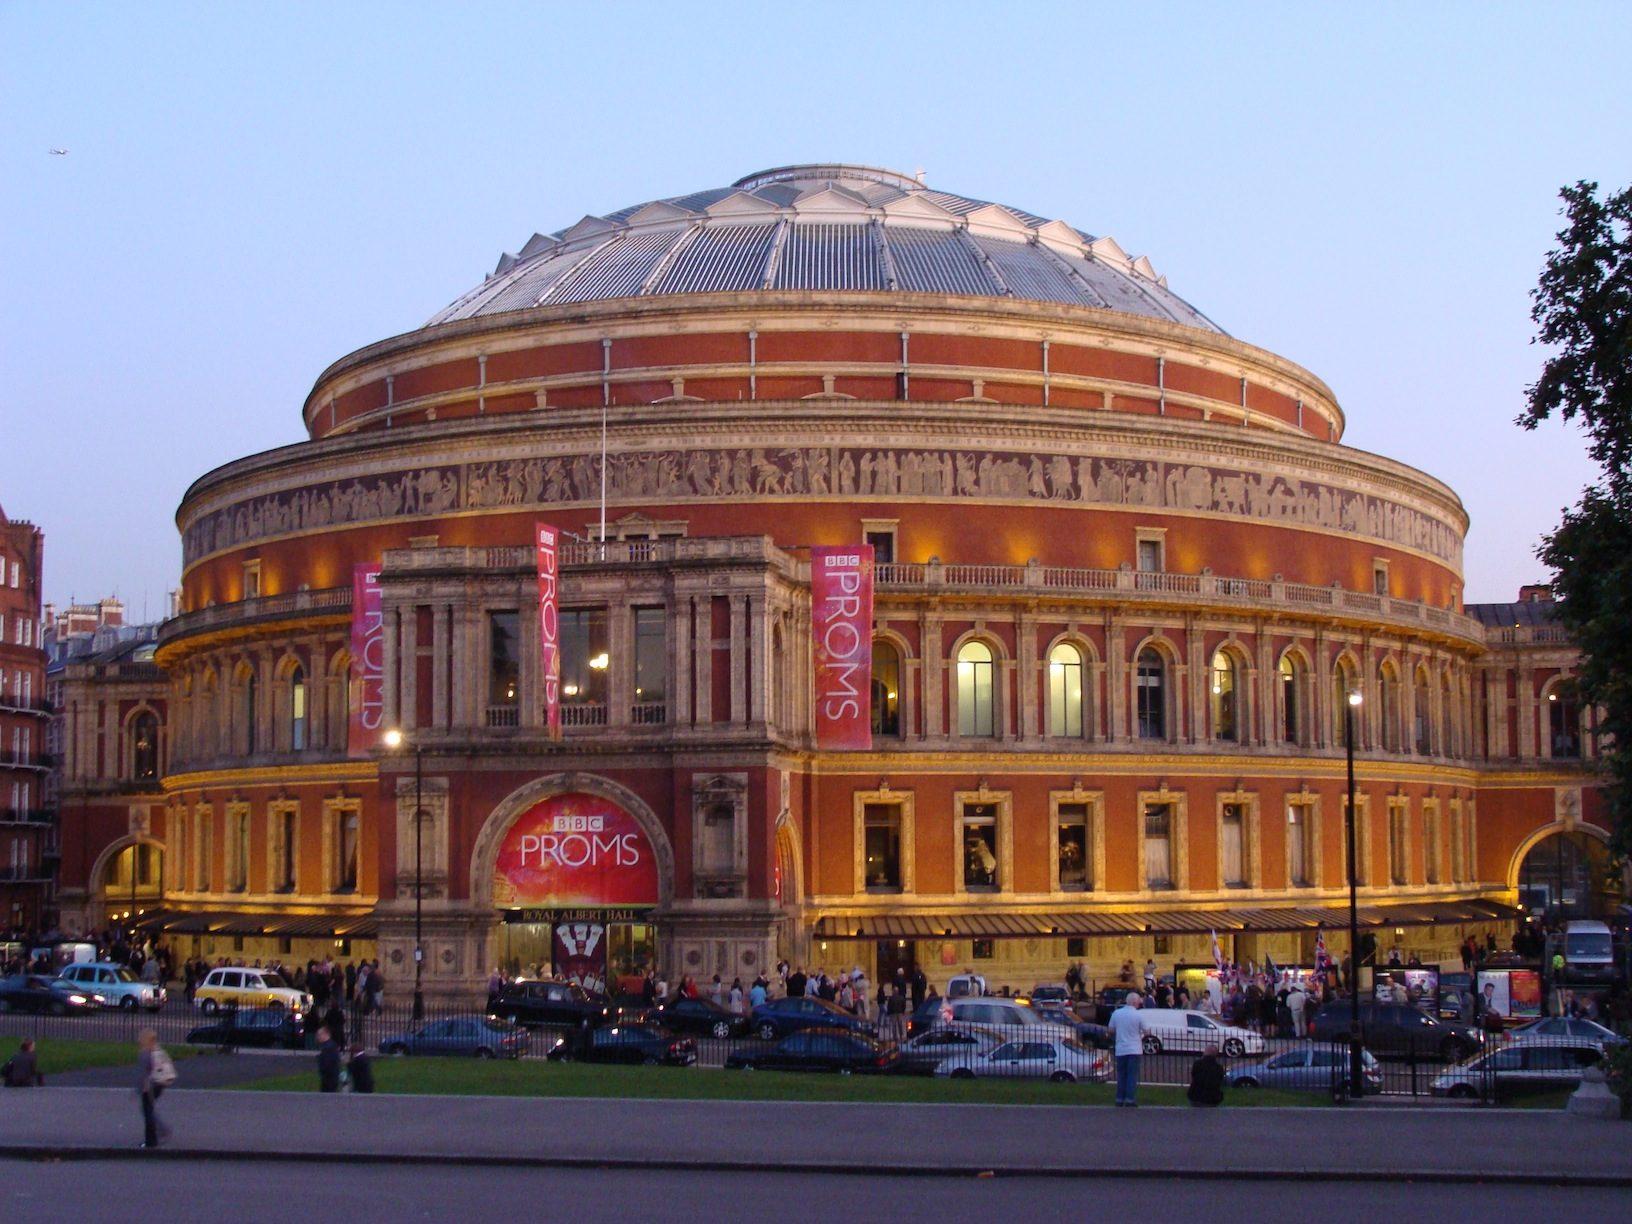 Top 10 London: Top Ten Things to Do in Knightsbridge and South Kensington